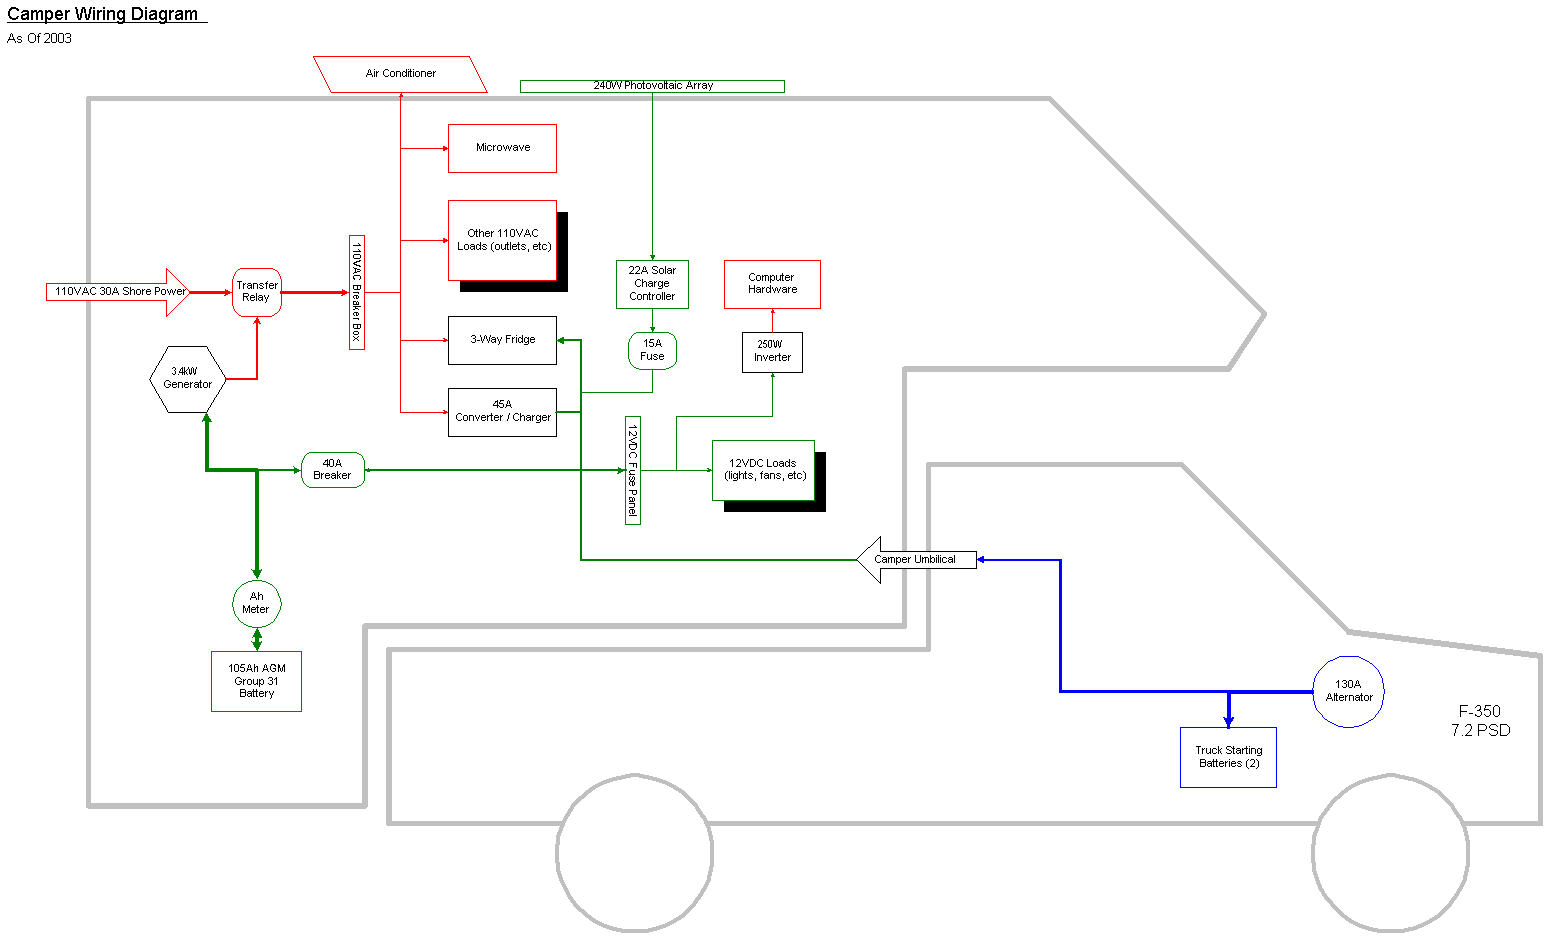 Diagram Fleetwood Rv Wiring Diagram Full Version Hd Quality Wiring Diagram Diagramleone Abacusfirenze It